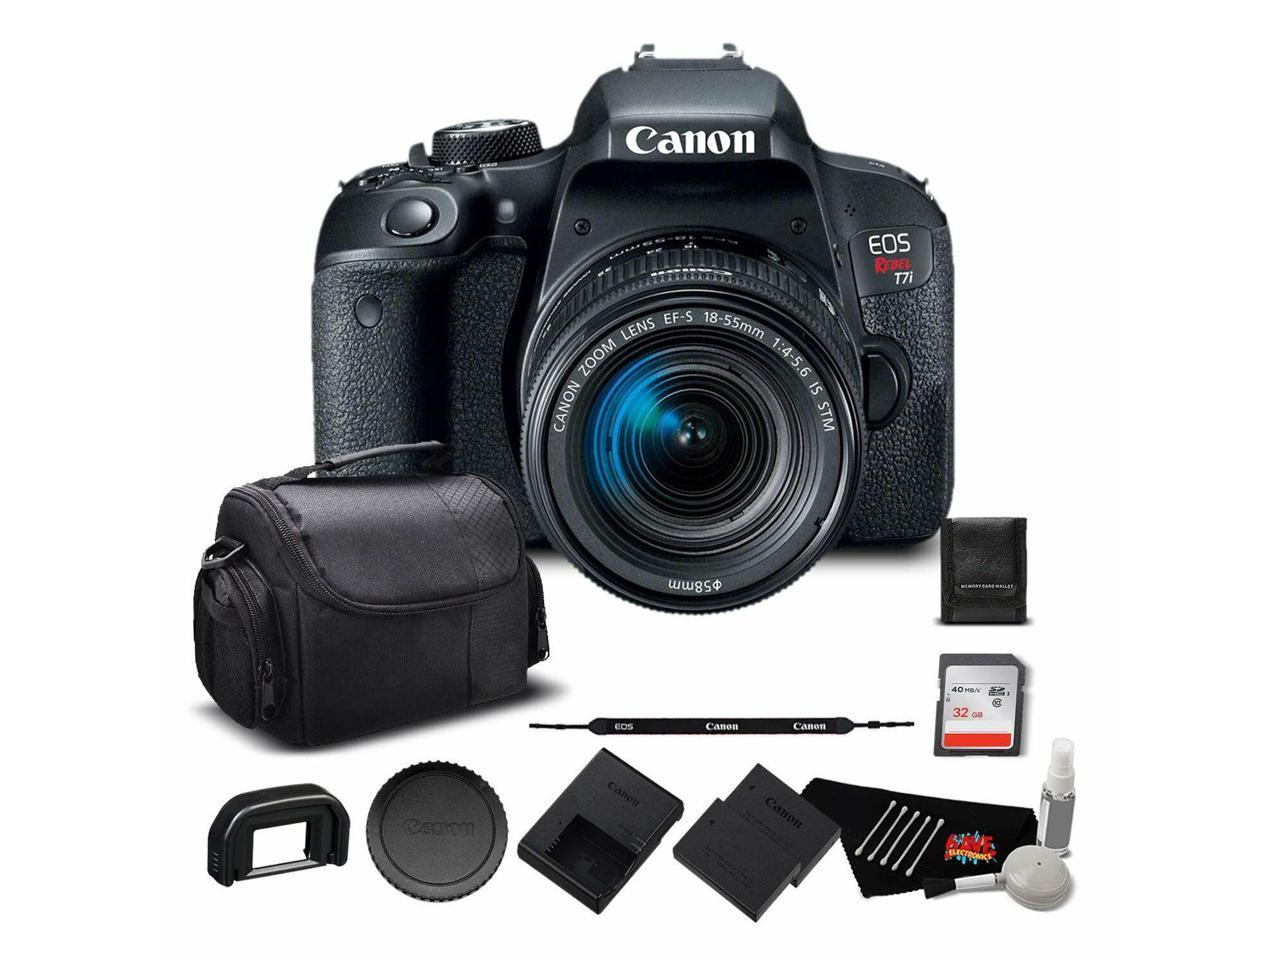 Memory Cards Samsung NX210 Digital Camera Memory Card 2 x 32GB Secure Digital High Capacity 2 Pack SDHC